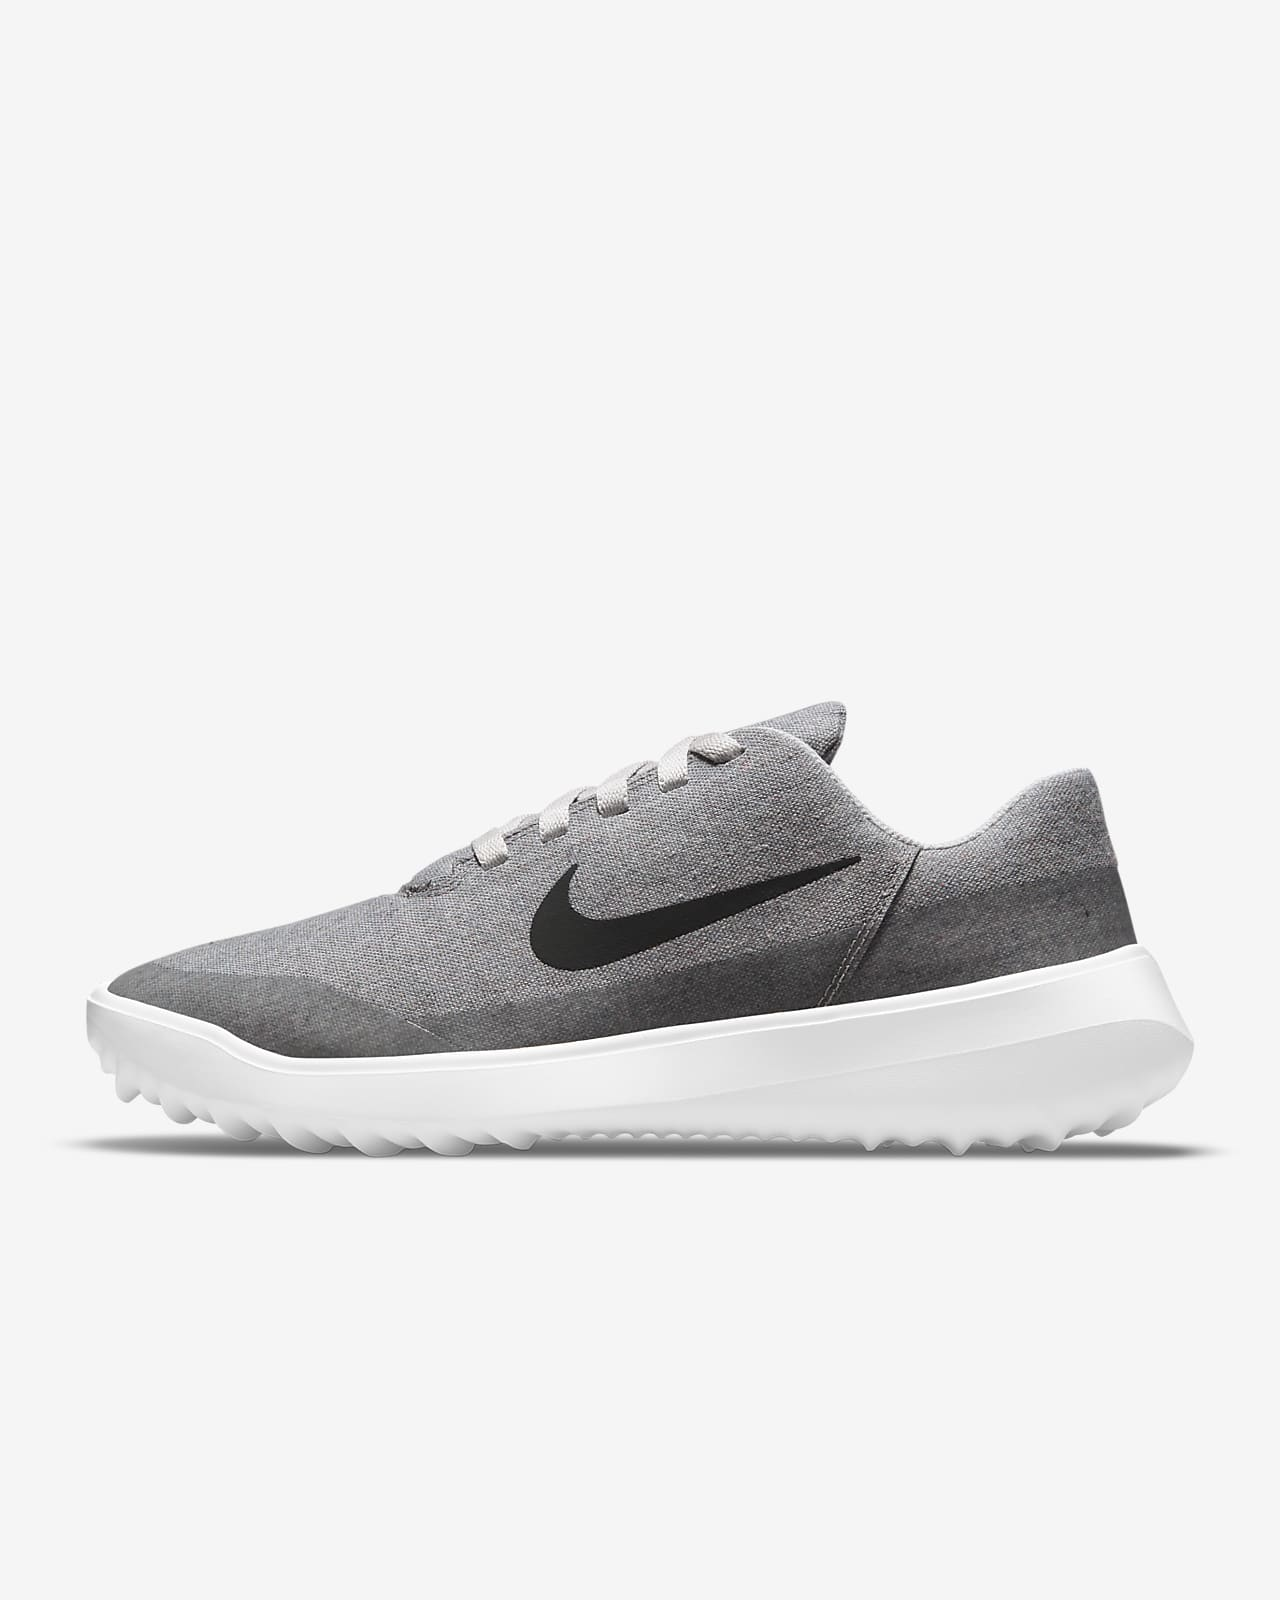 Chaussure de golf Nike Victory G Lite